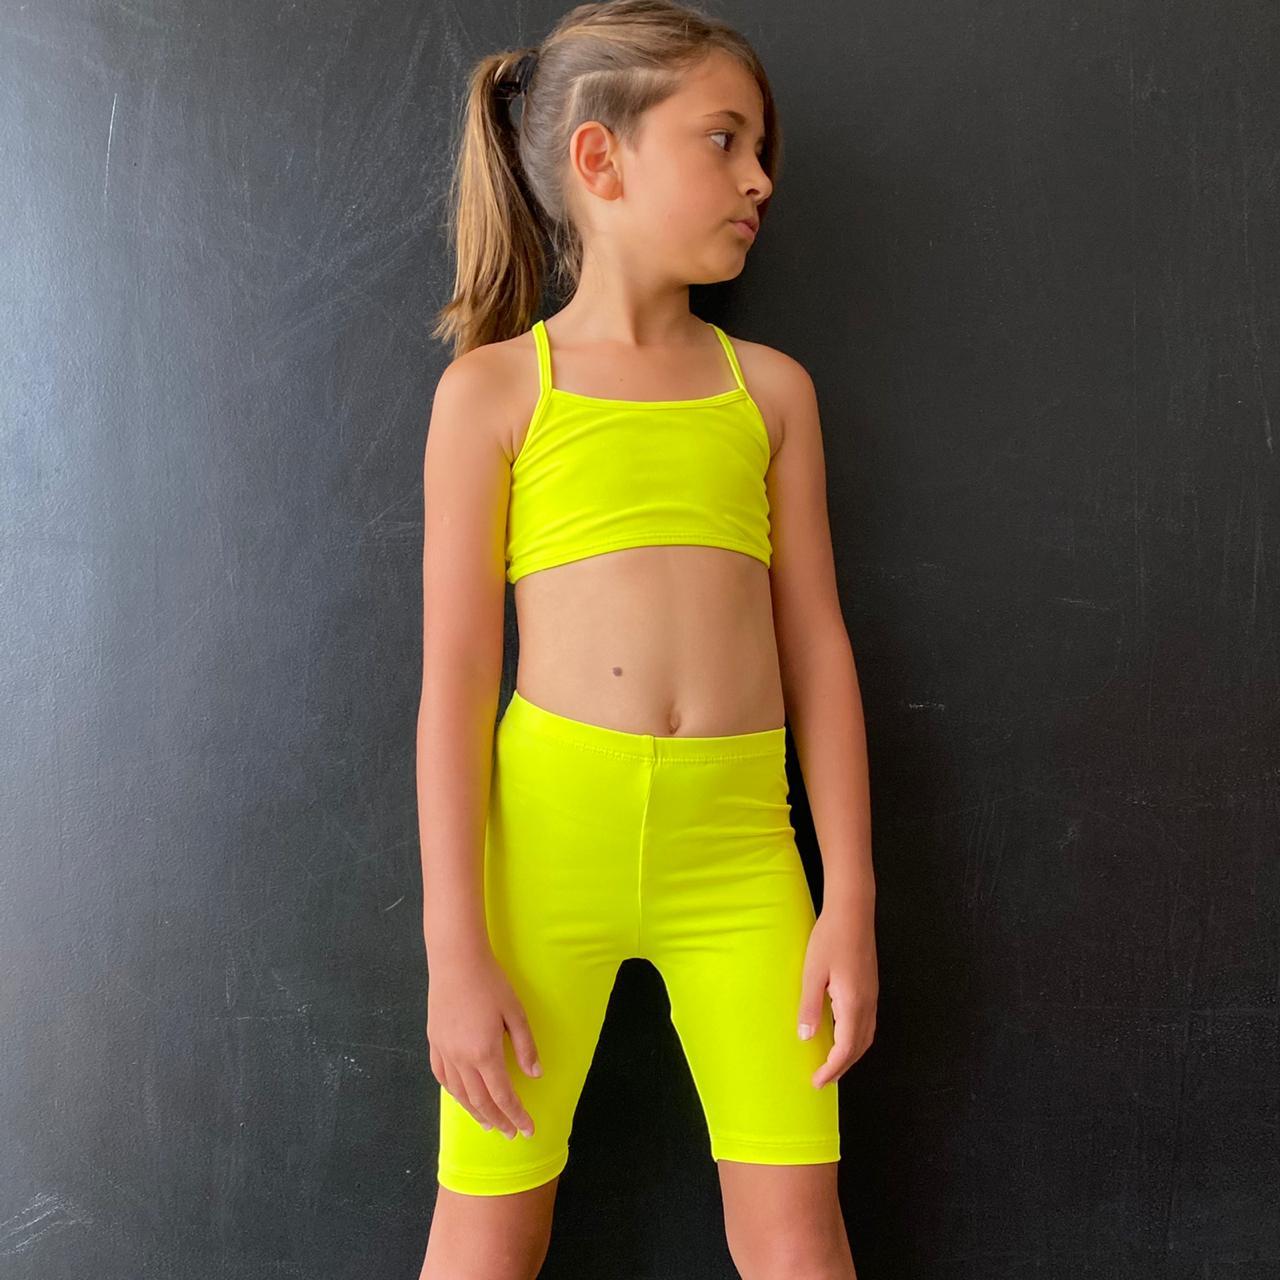 Top Infantil Neon Marca Texto Amarelo